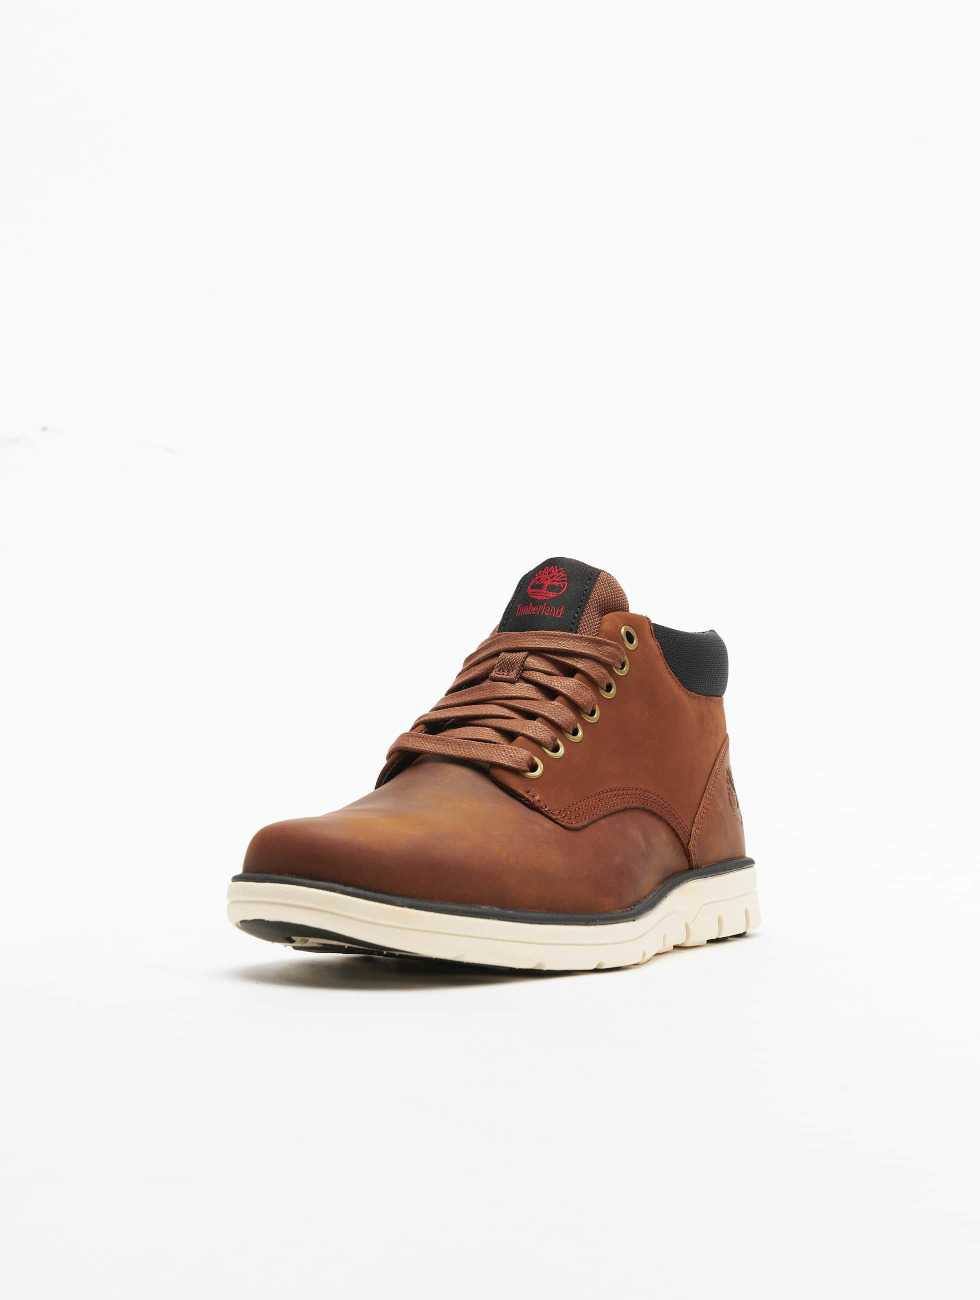 Timberland Sneakers Bradstreet Chukka Leather brown